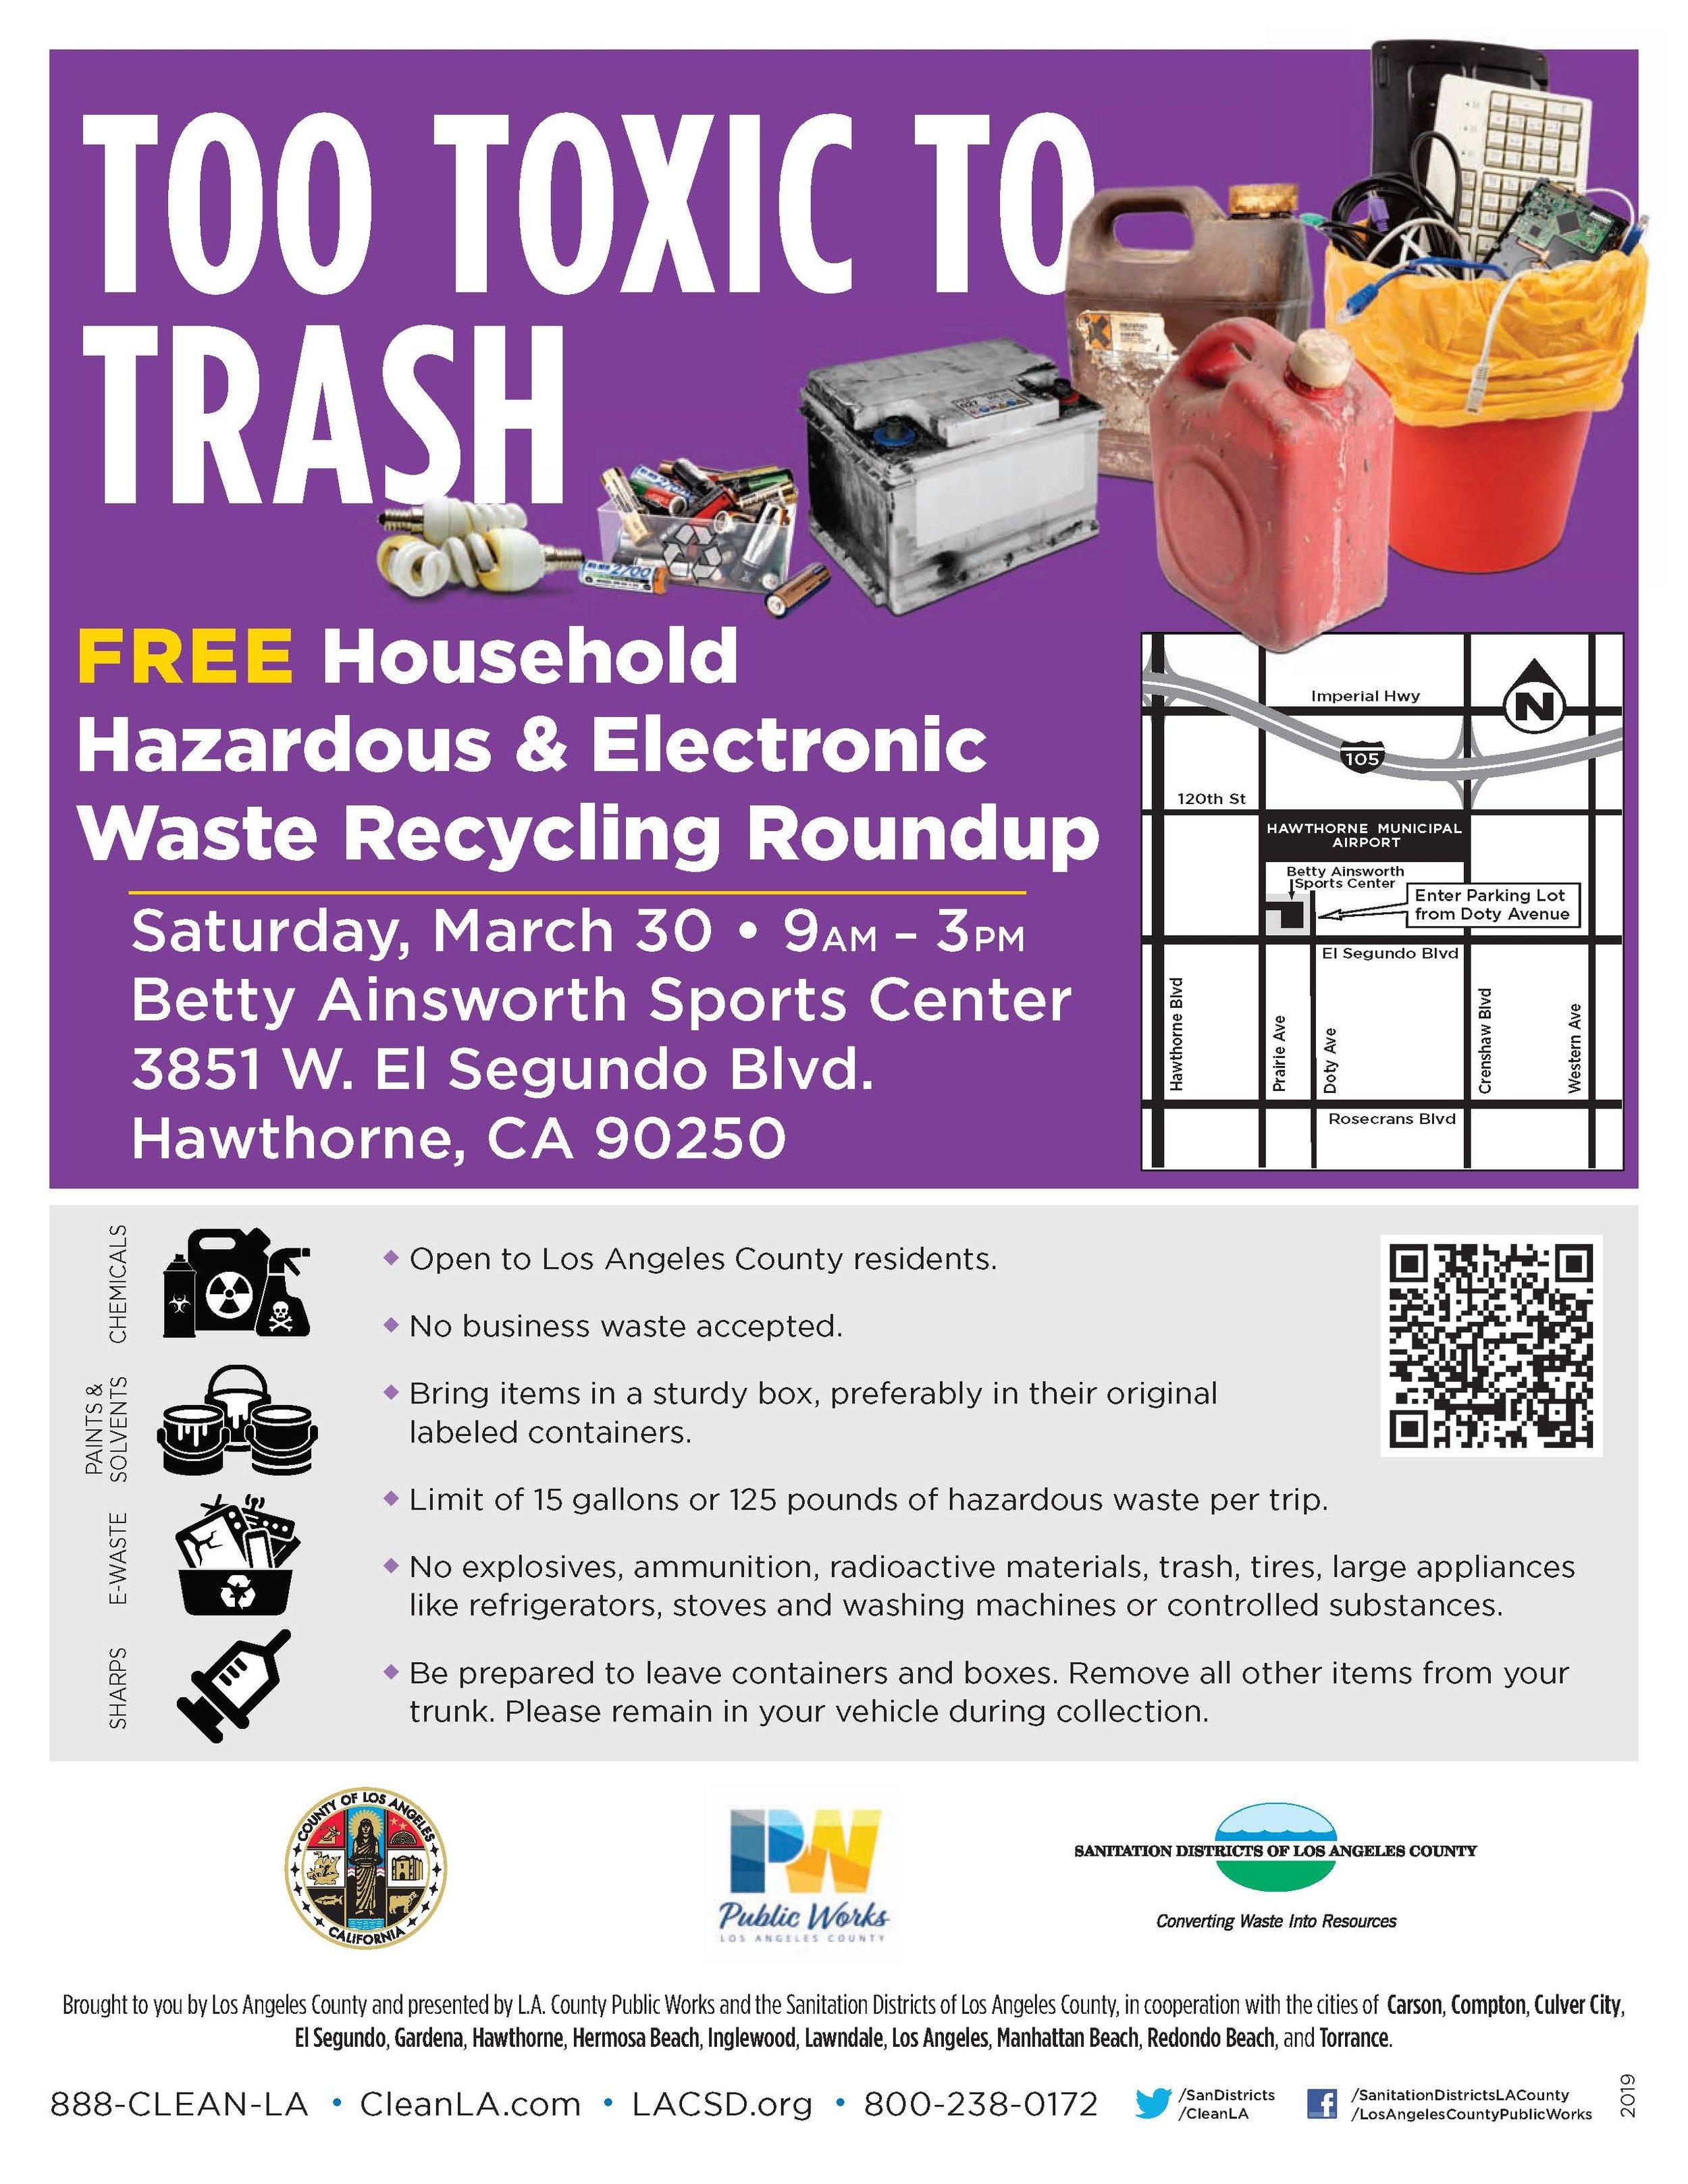 Household Hazardous & Electronic Waste Recycling Roundup